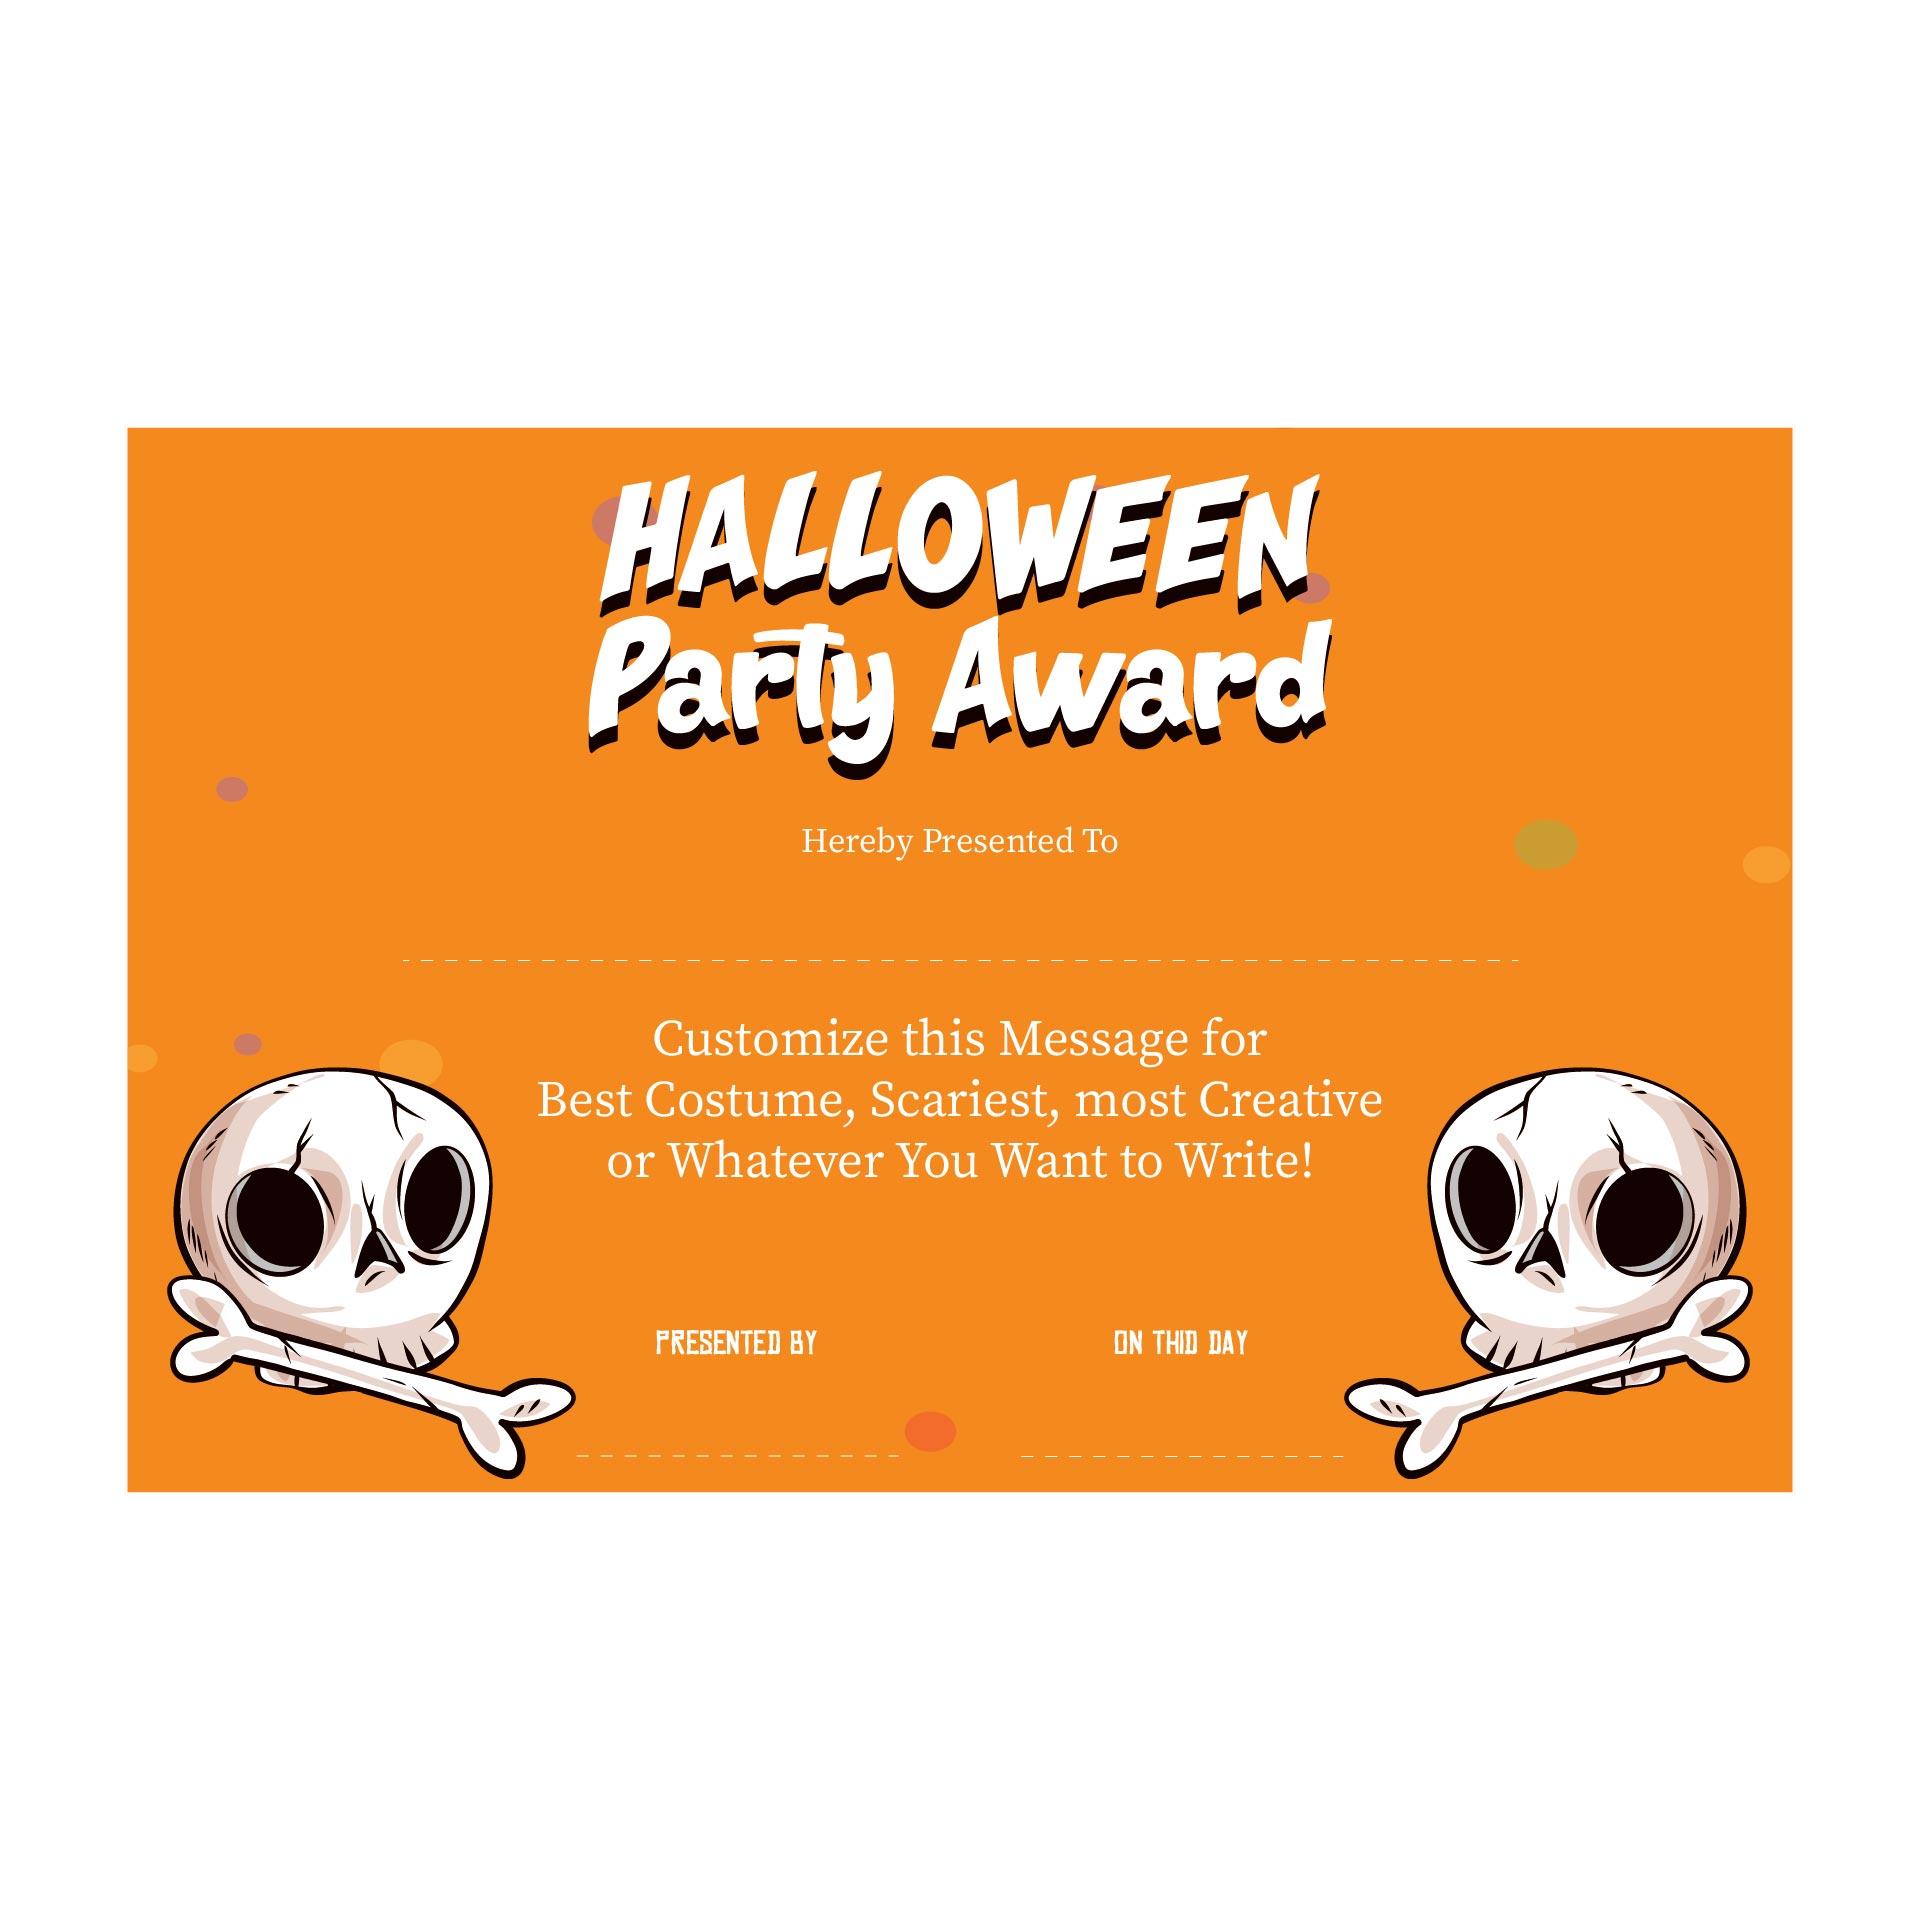 Cool Halloween Costume Awards